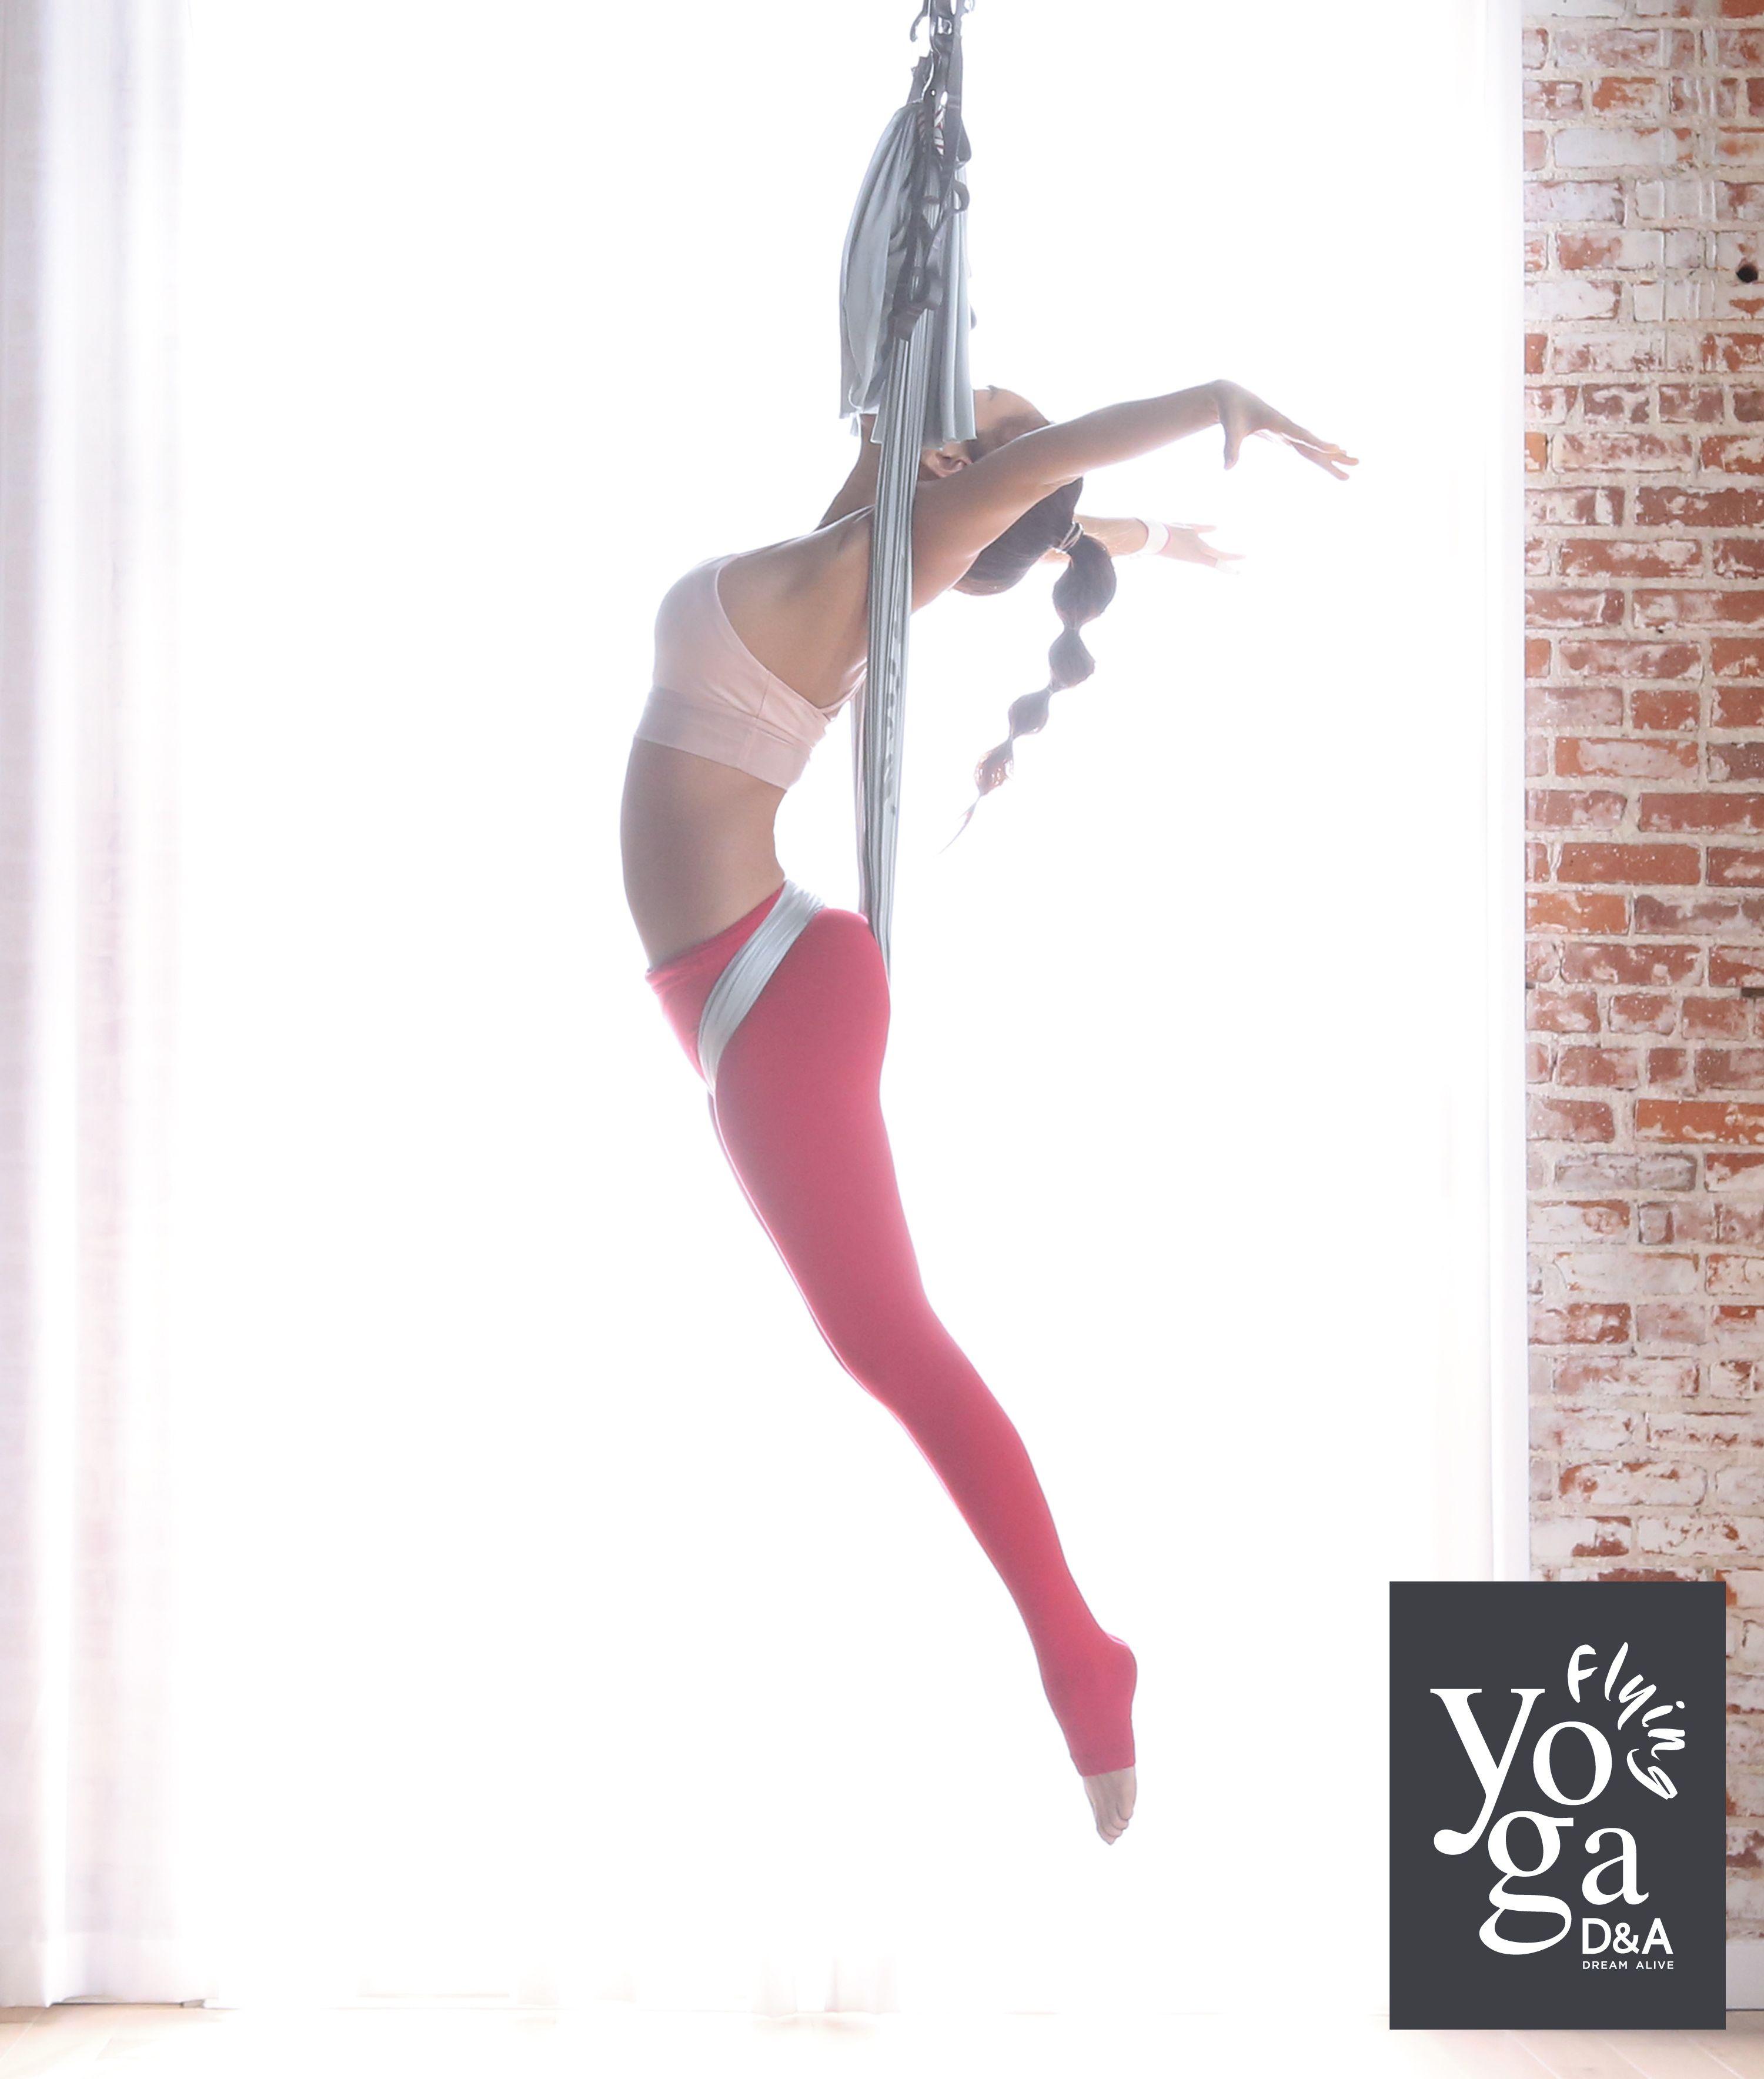 Flying Up Danda Flying Yoga D A Flying Yoga Aerial Yoga Aerial Yoga Flying Yoga Yoga Trapeze Poses